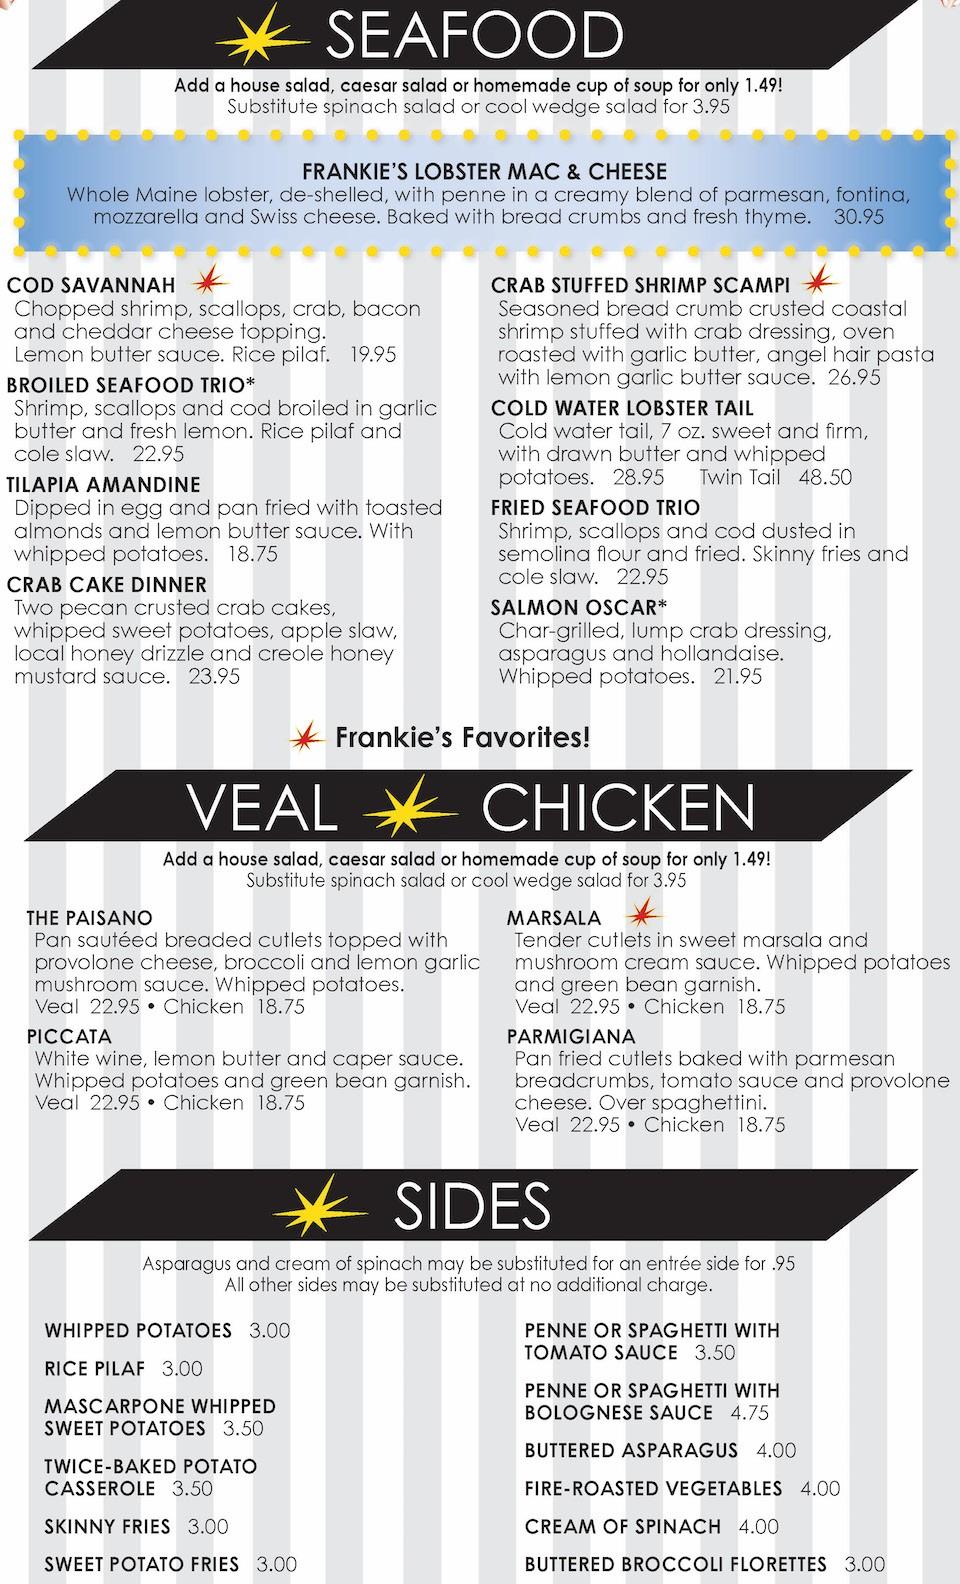 Frankie Bones Menu - Seafood, Veal, Chicken, Sides